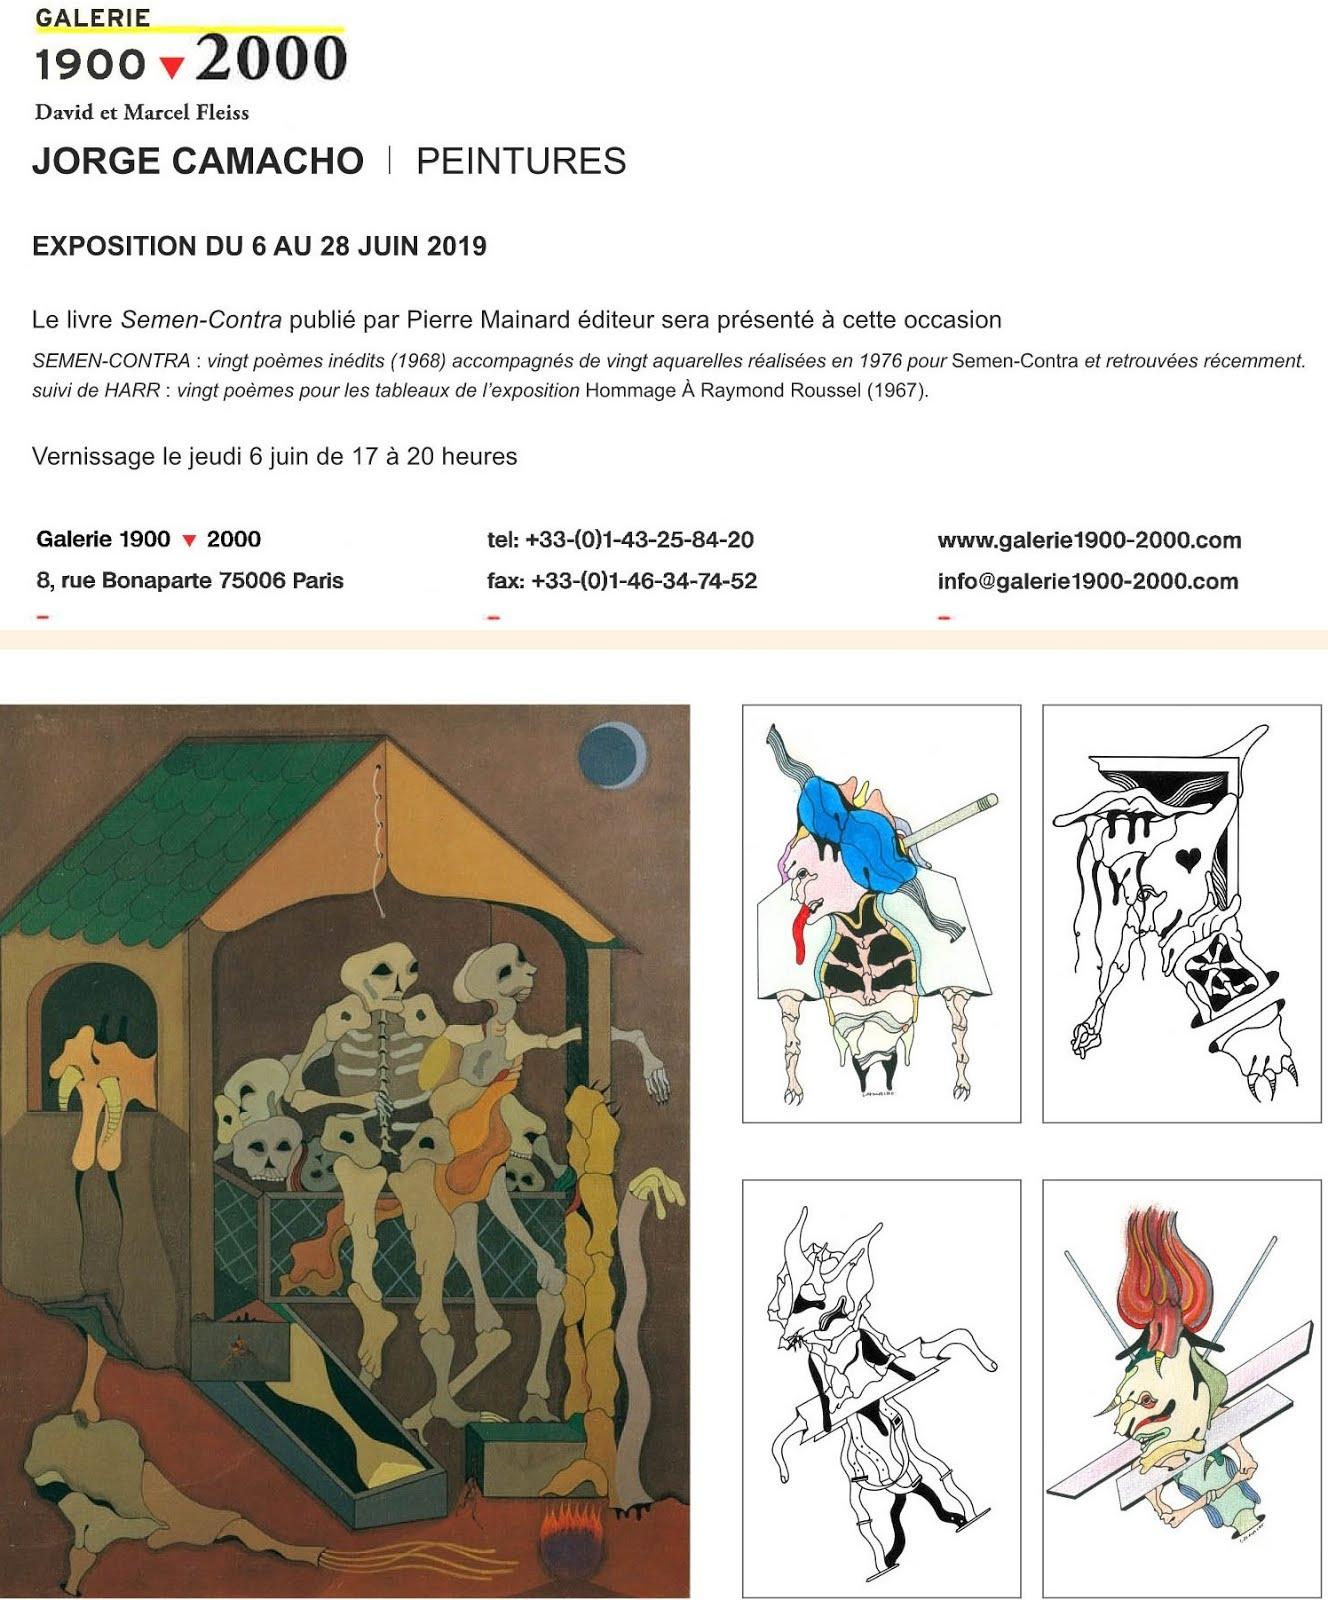 JORGE CAMACHO, EXPOSITION PEINTURES, GALERIE 1900-2000, PARIS 6E